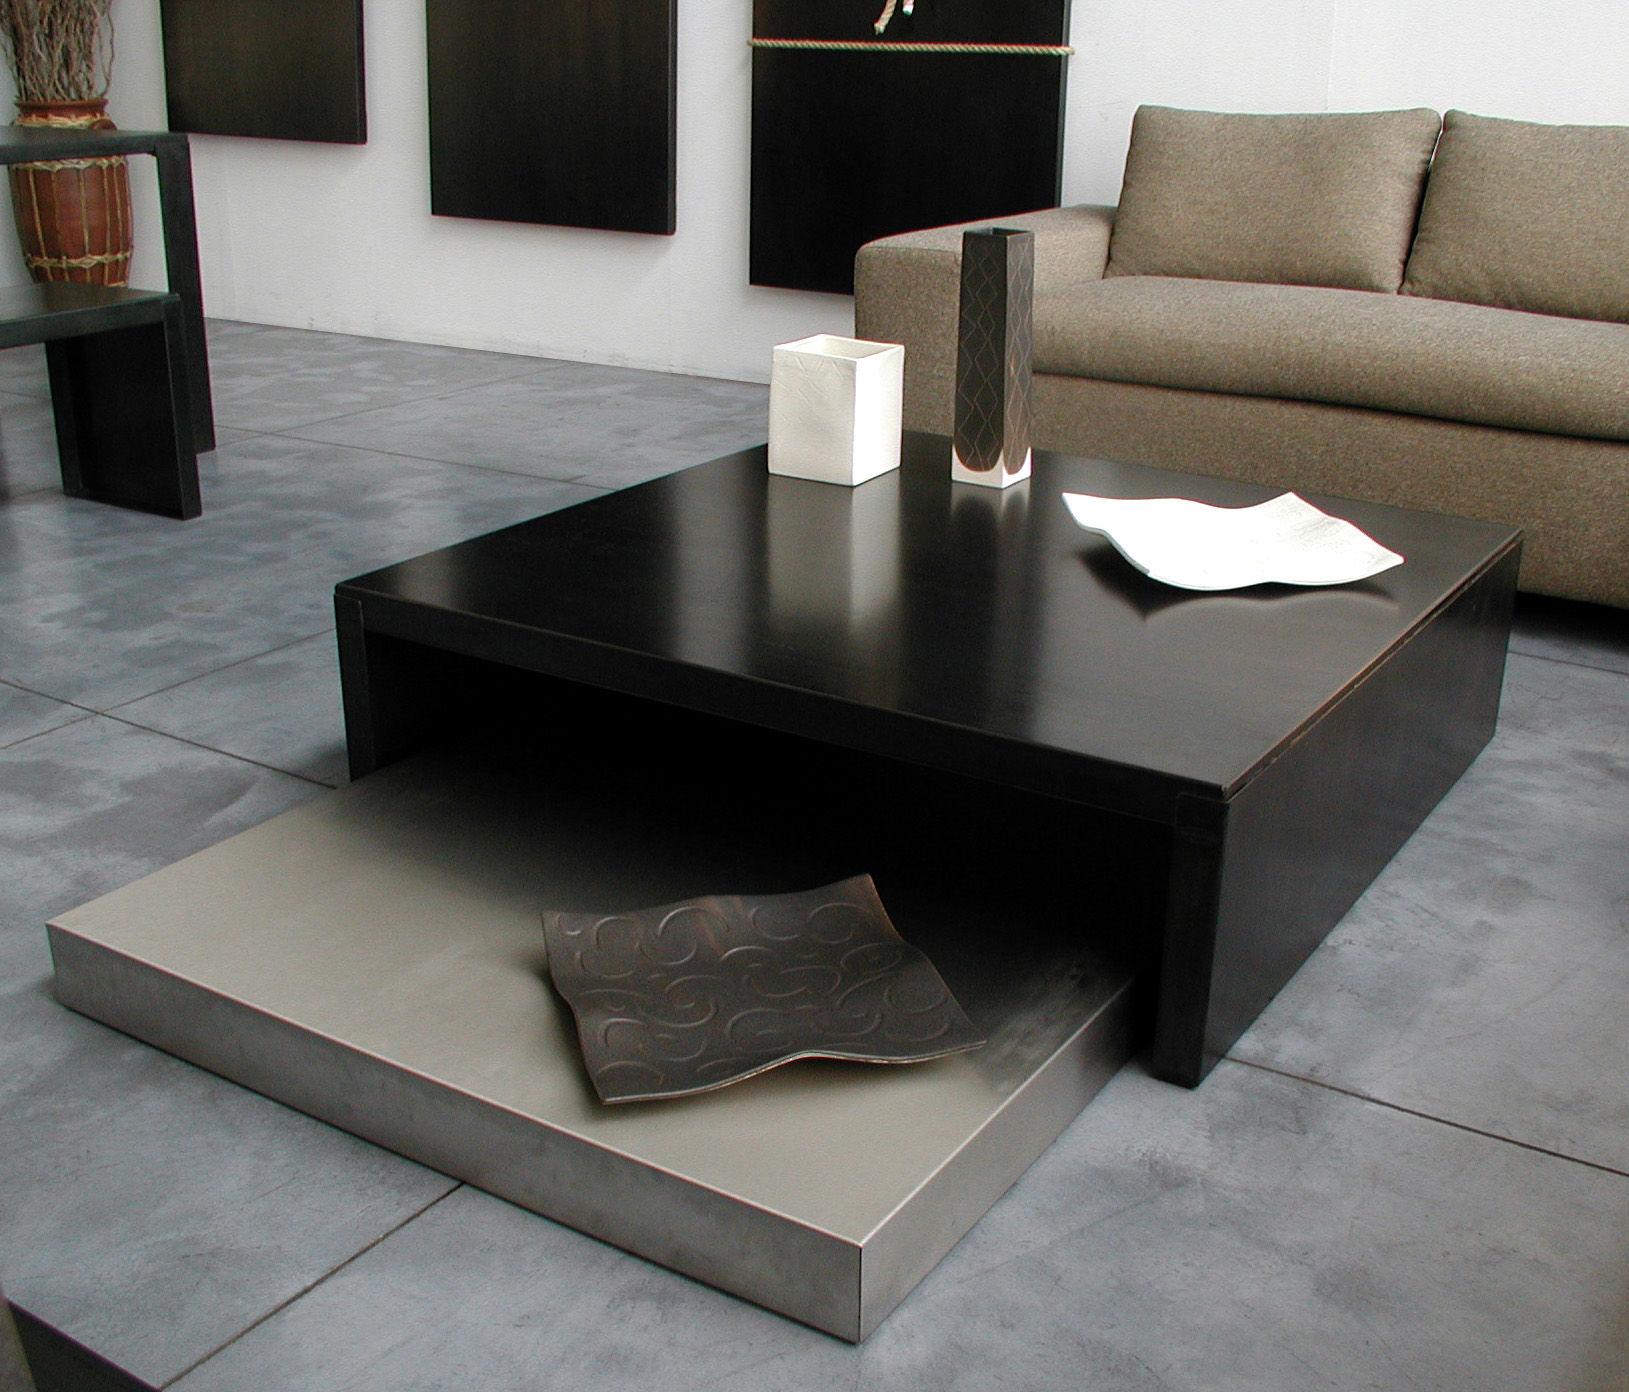 Max & Moritz Nested tables  Black phosphated steel Black